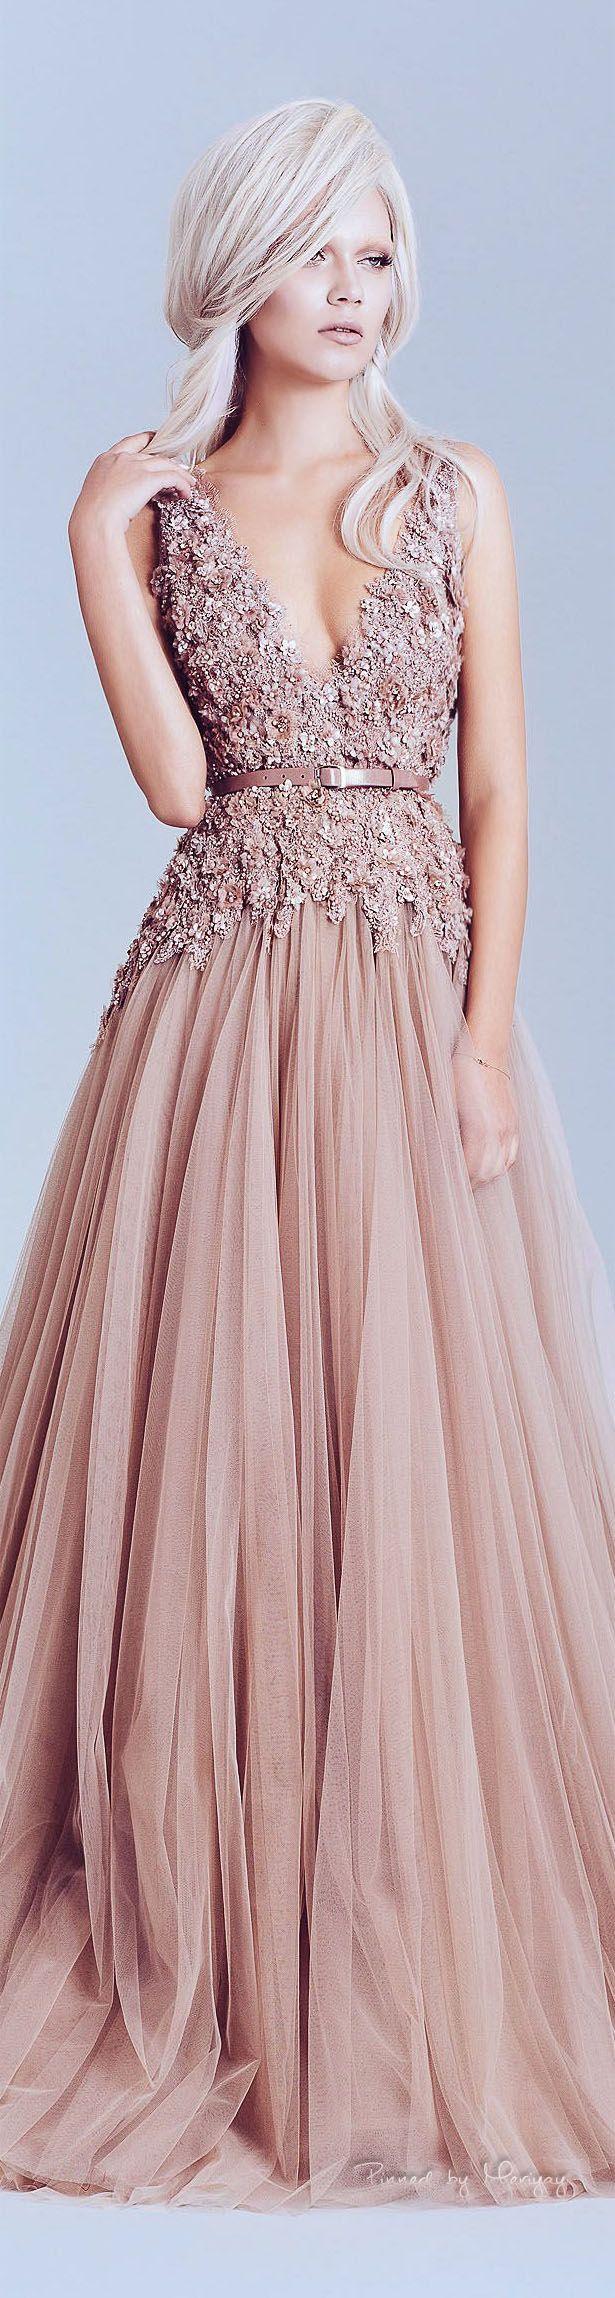 gorgeous dress bridesmaid dresses sequin bridesmaid dresses